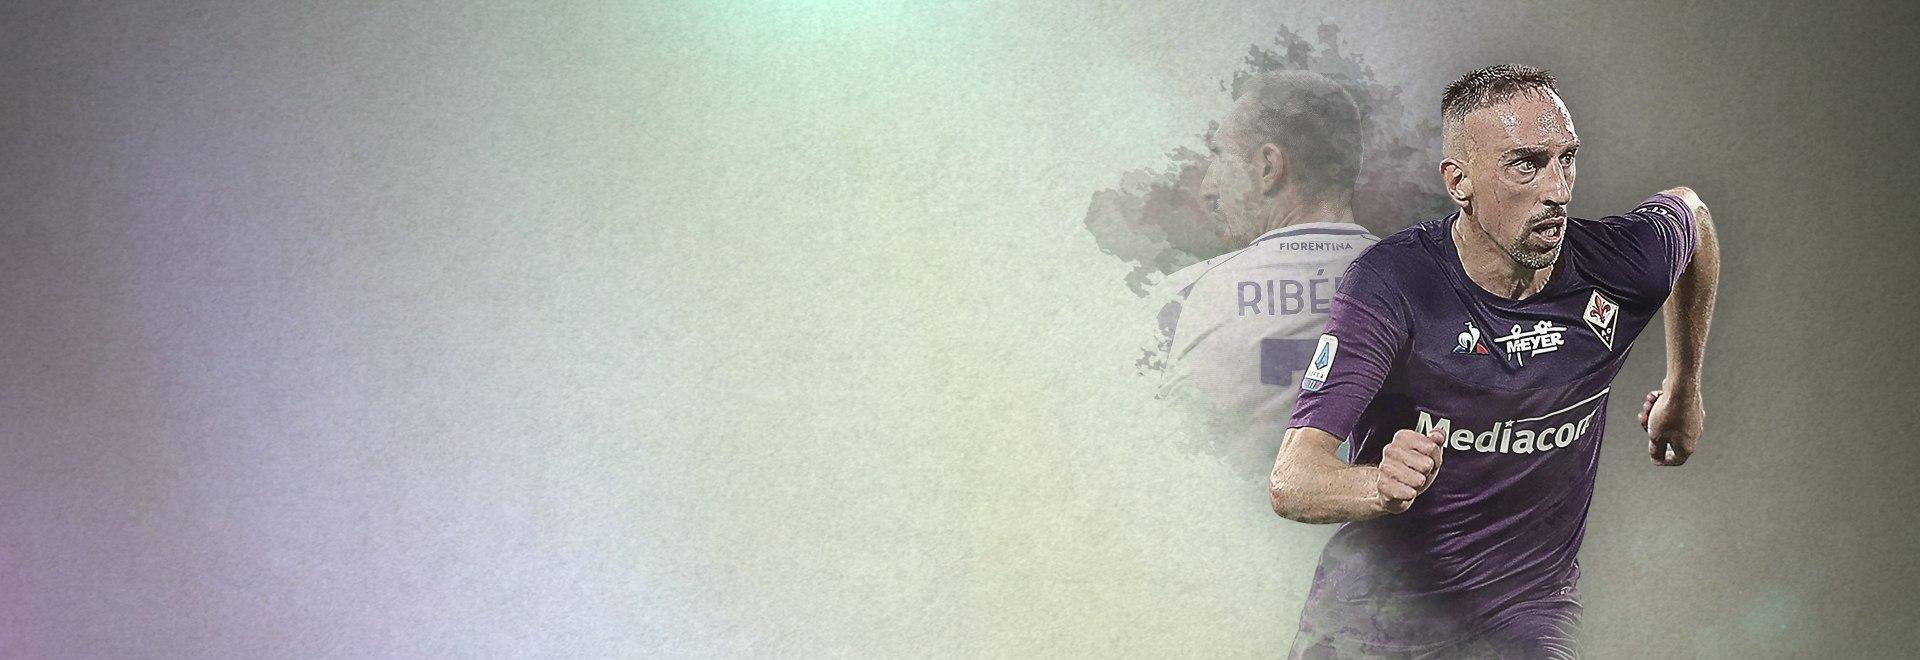 Franck Ribery, una vita in dribbling